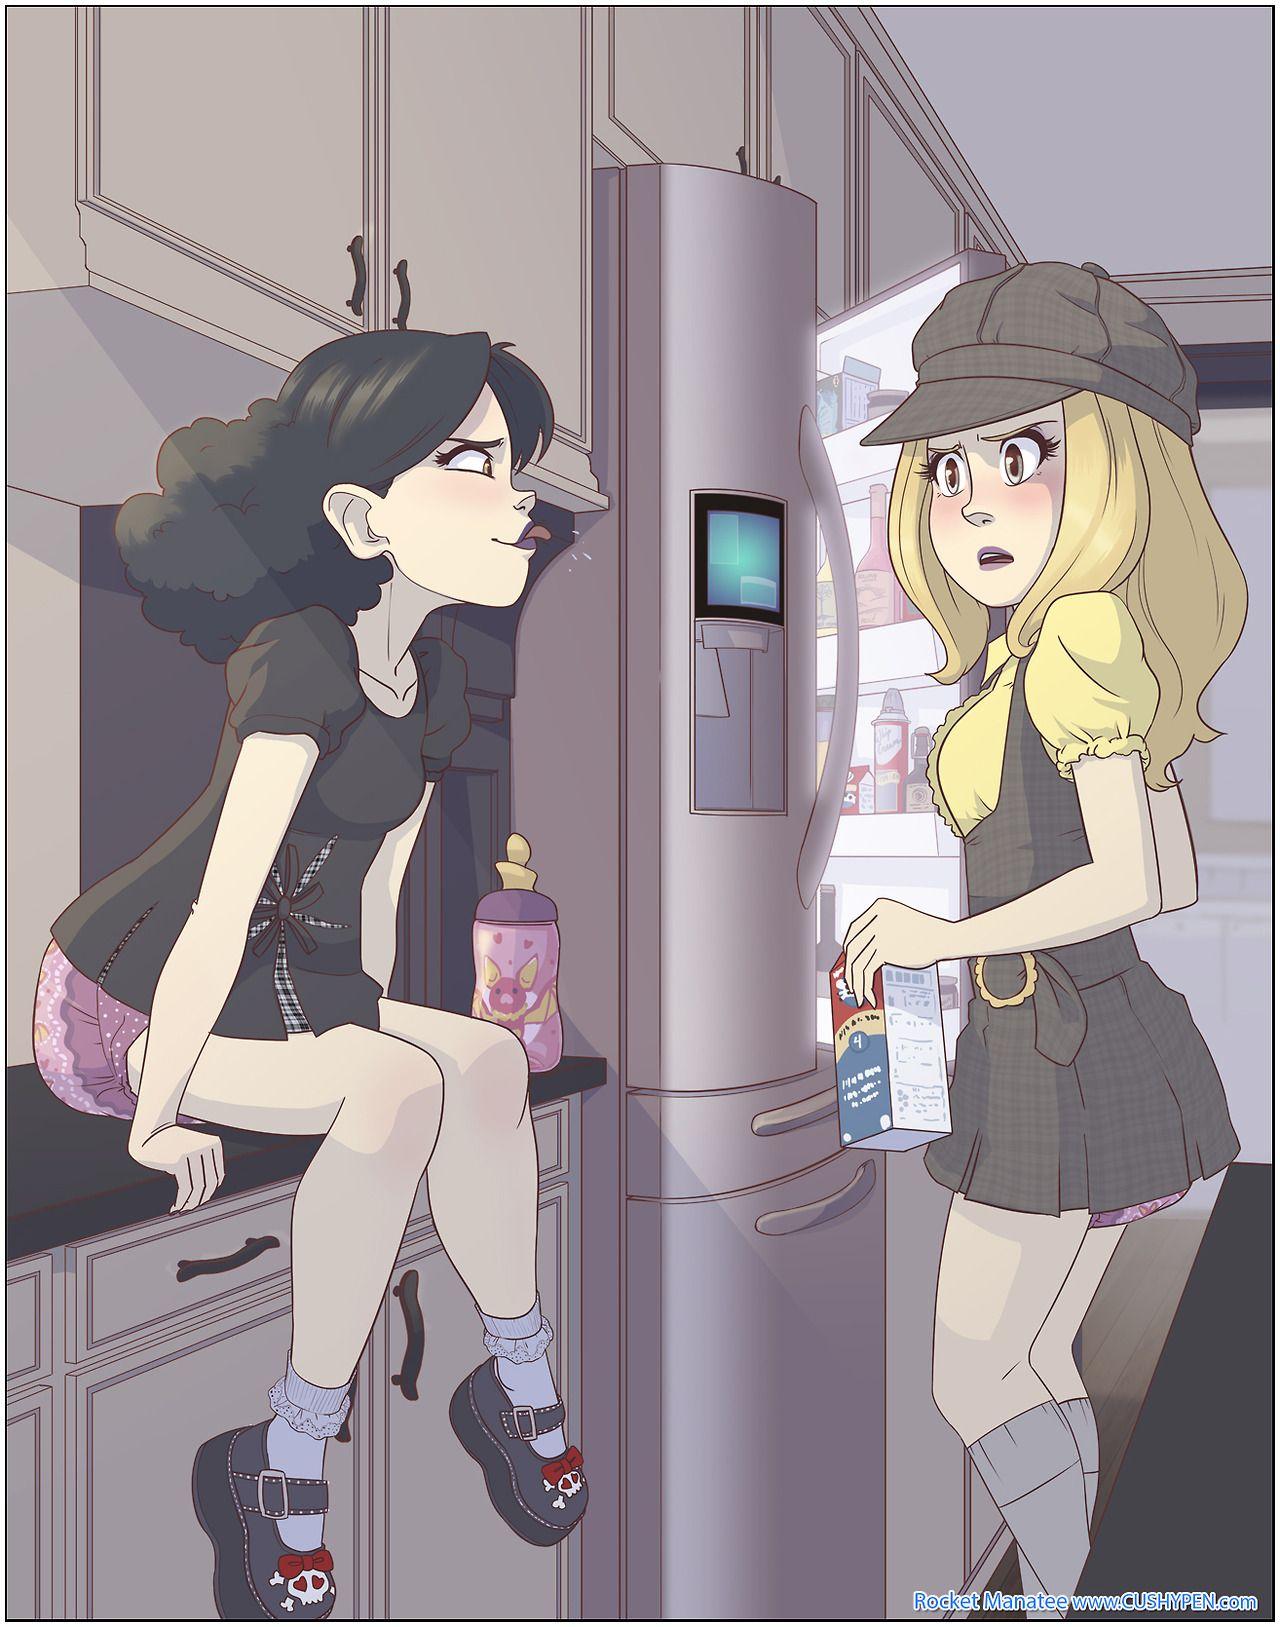 Diapered Girls Anime Manga Art Anime Baby Anime Diaper Girl